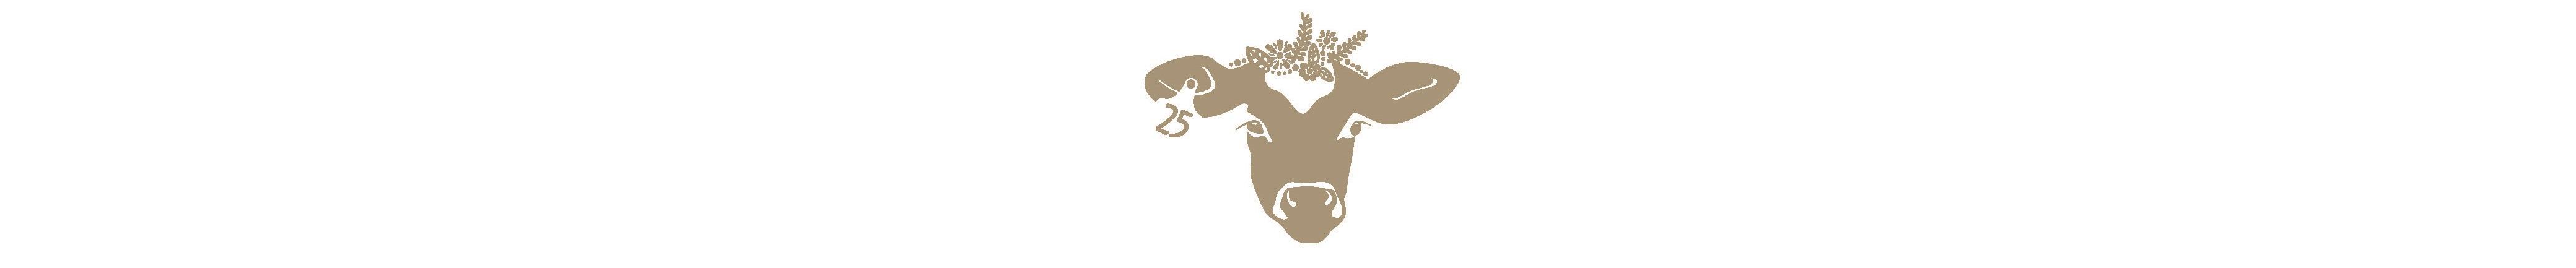 Logo unten